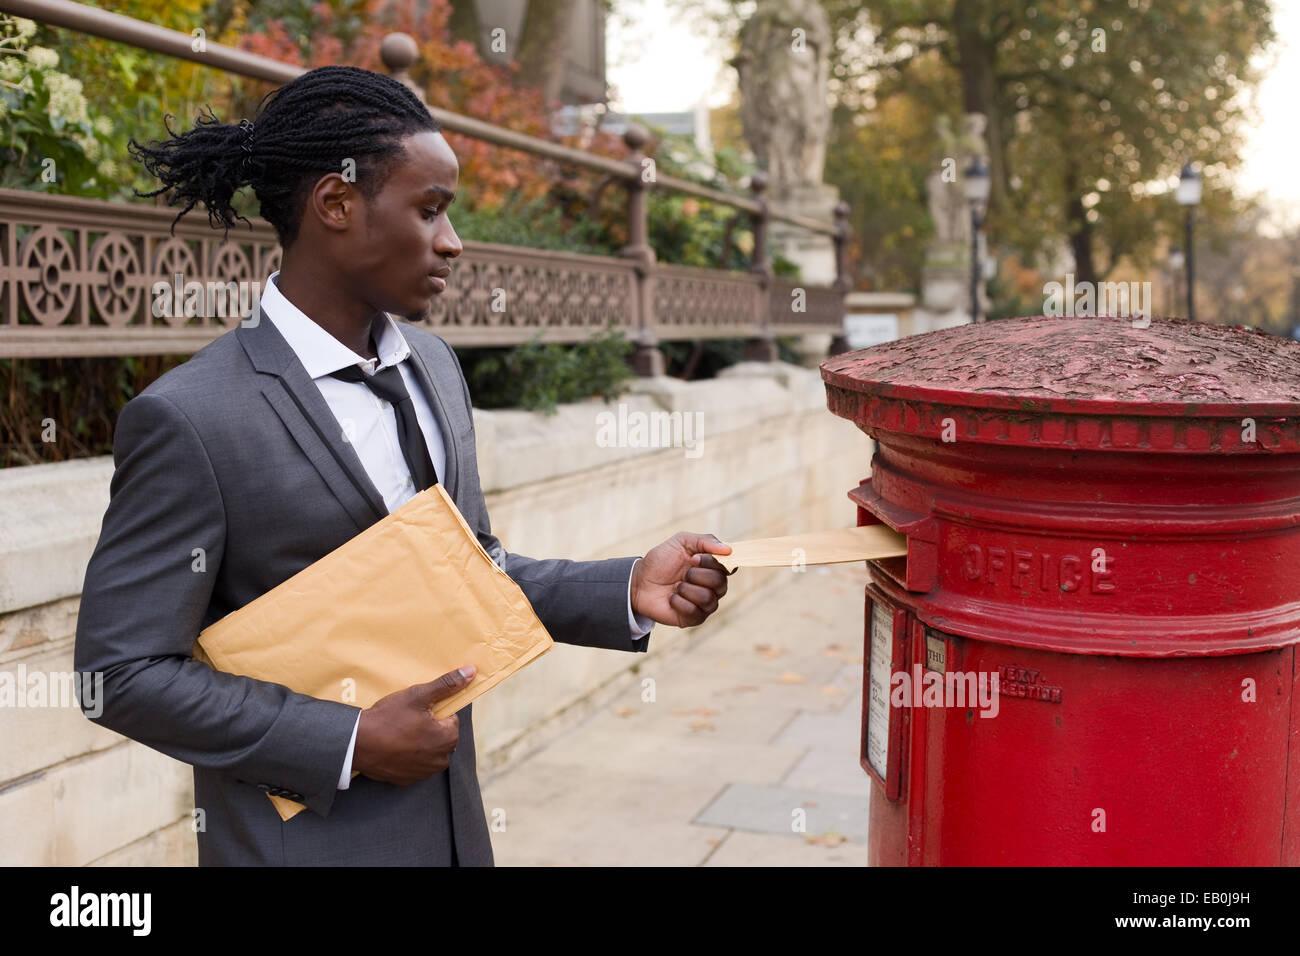 business man sending letters - Stock Image